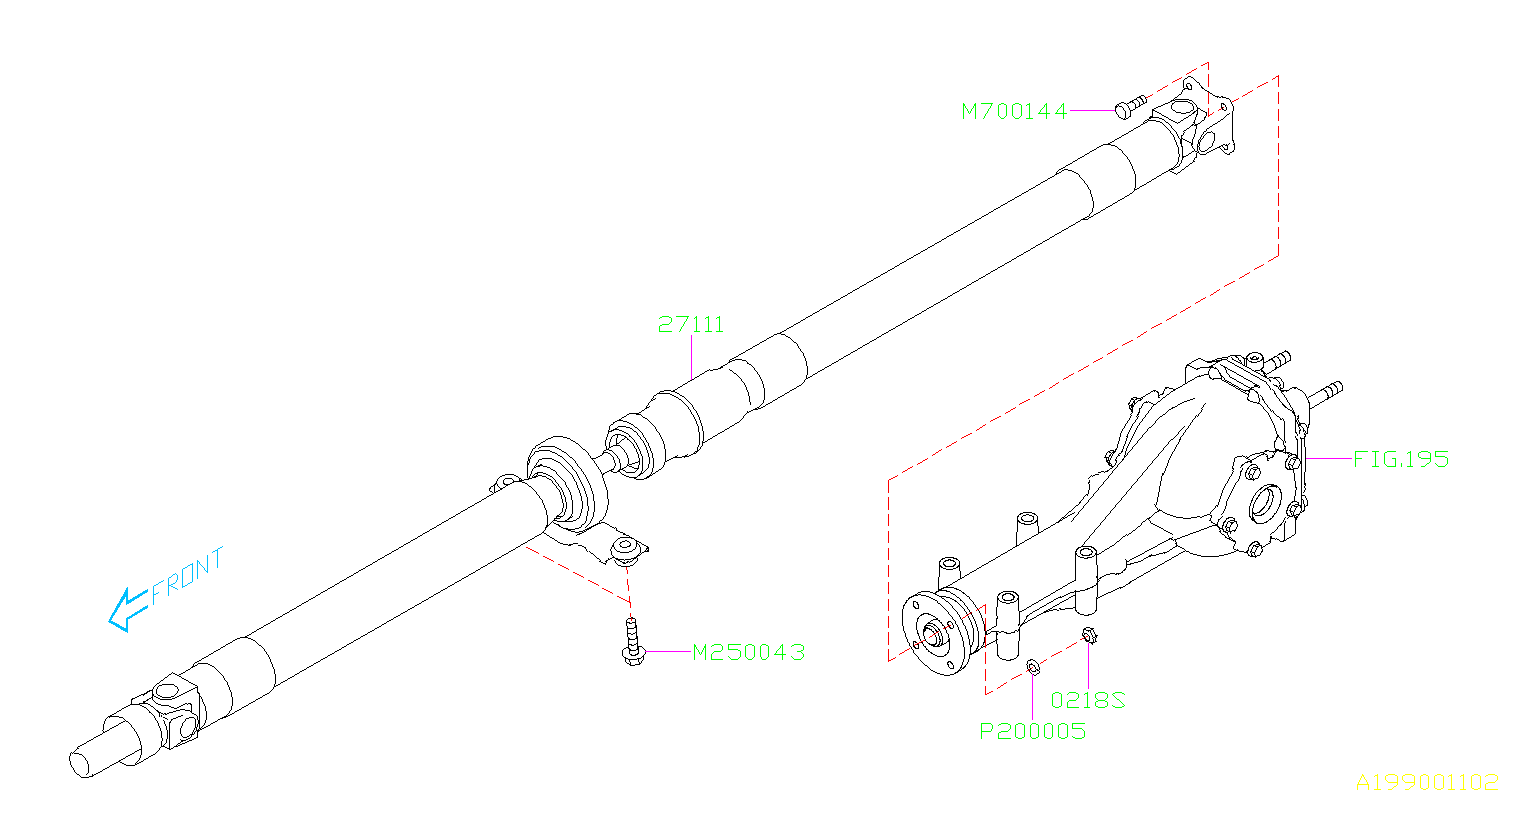 Subaru Forester Propeller shaft assembly. Driveline